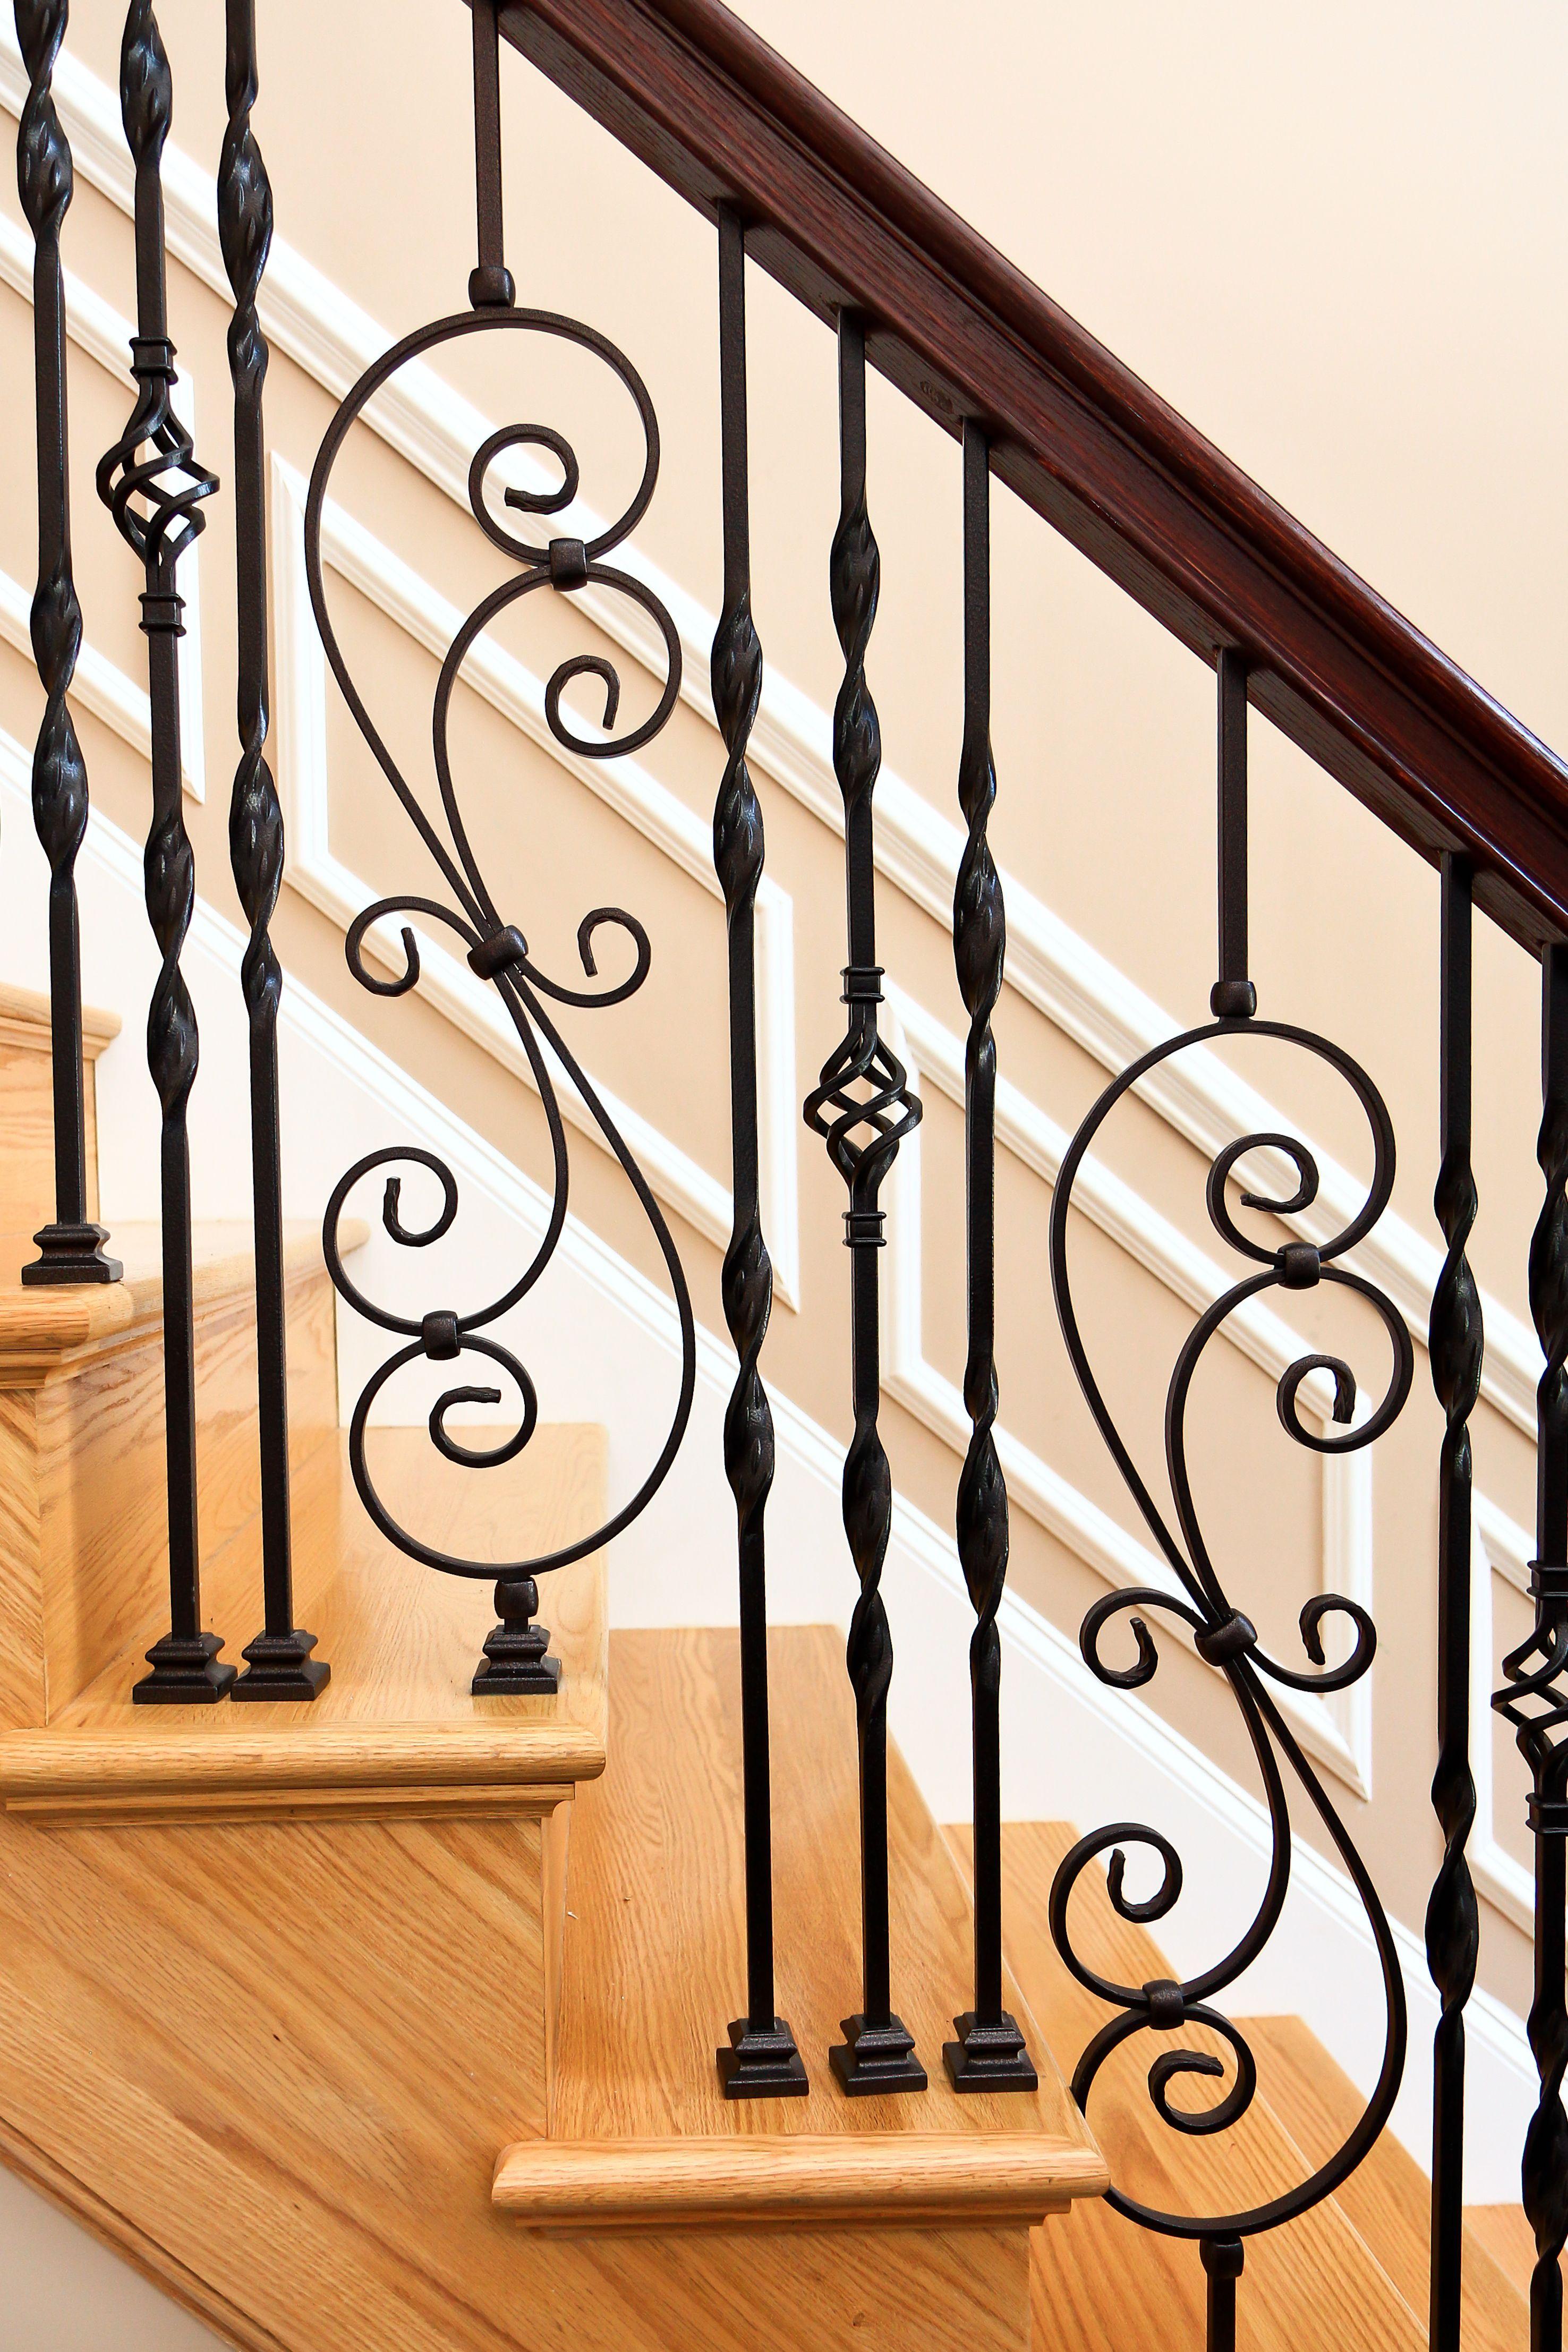 Staircase detail portones rejas en 2019 wrought iron for Puertas decorativas para interiores